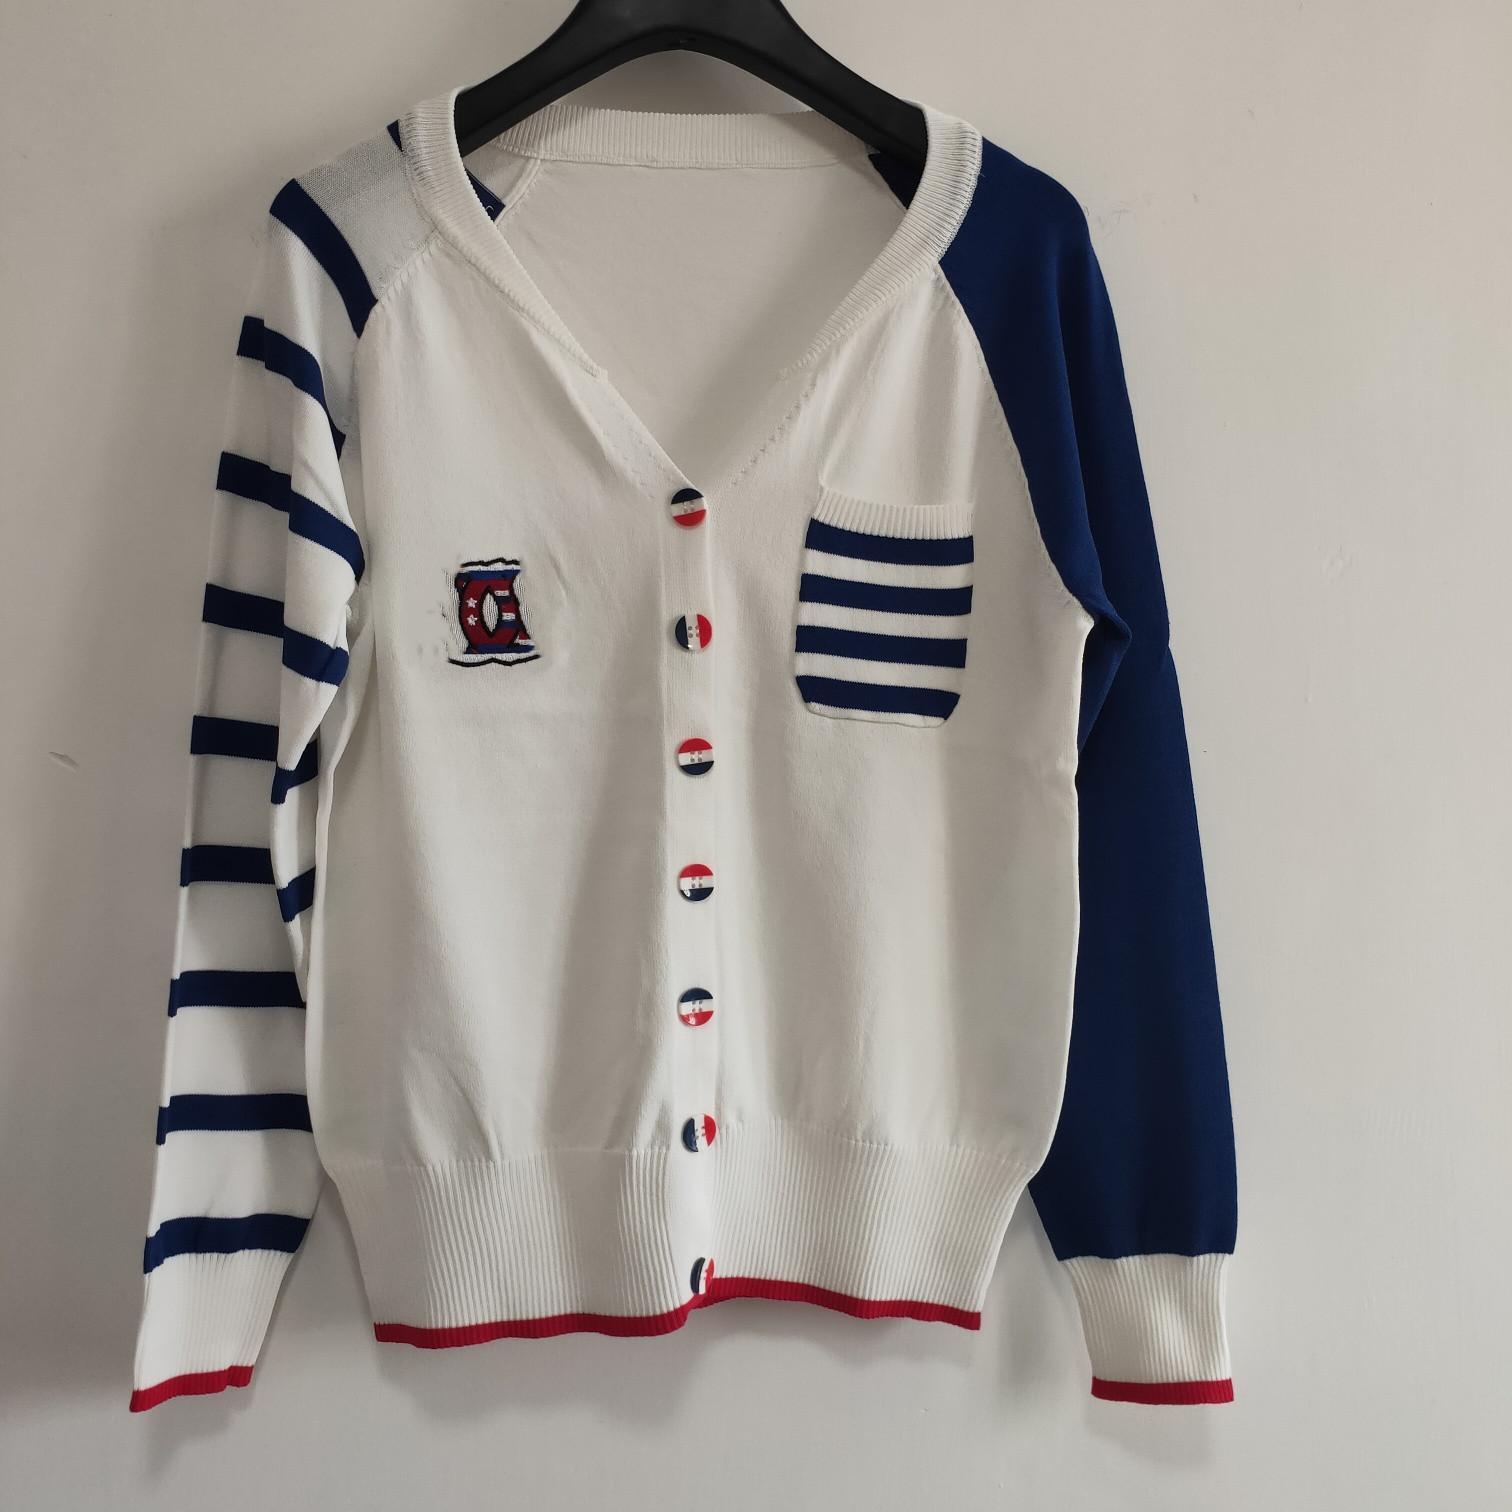 Milan Runway Pullover 2020 langen Ärmeln V-Neck Frauen-Pullover High End Jacquard Strickjacke Frauen Designer Sweater 0422-11